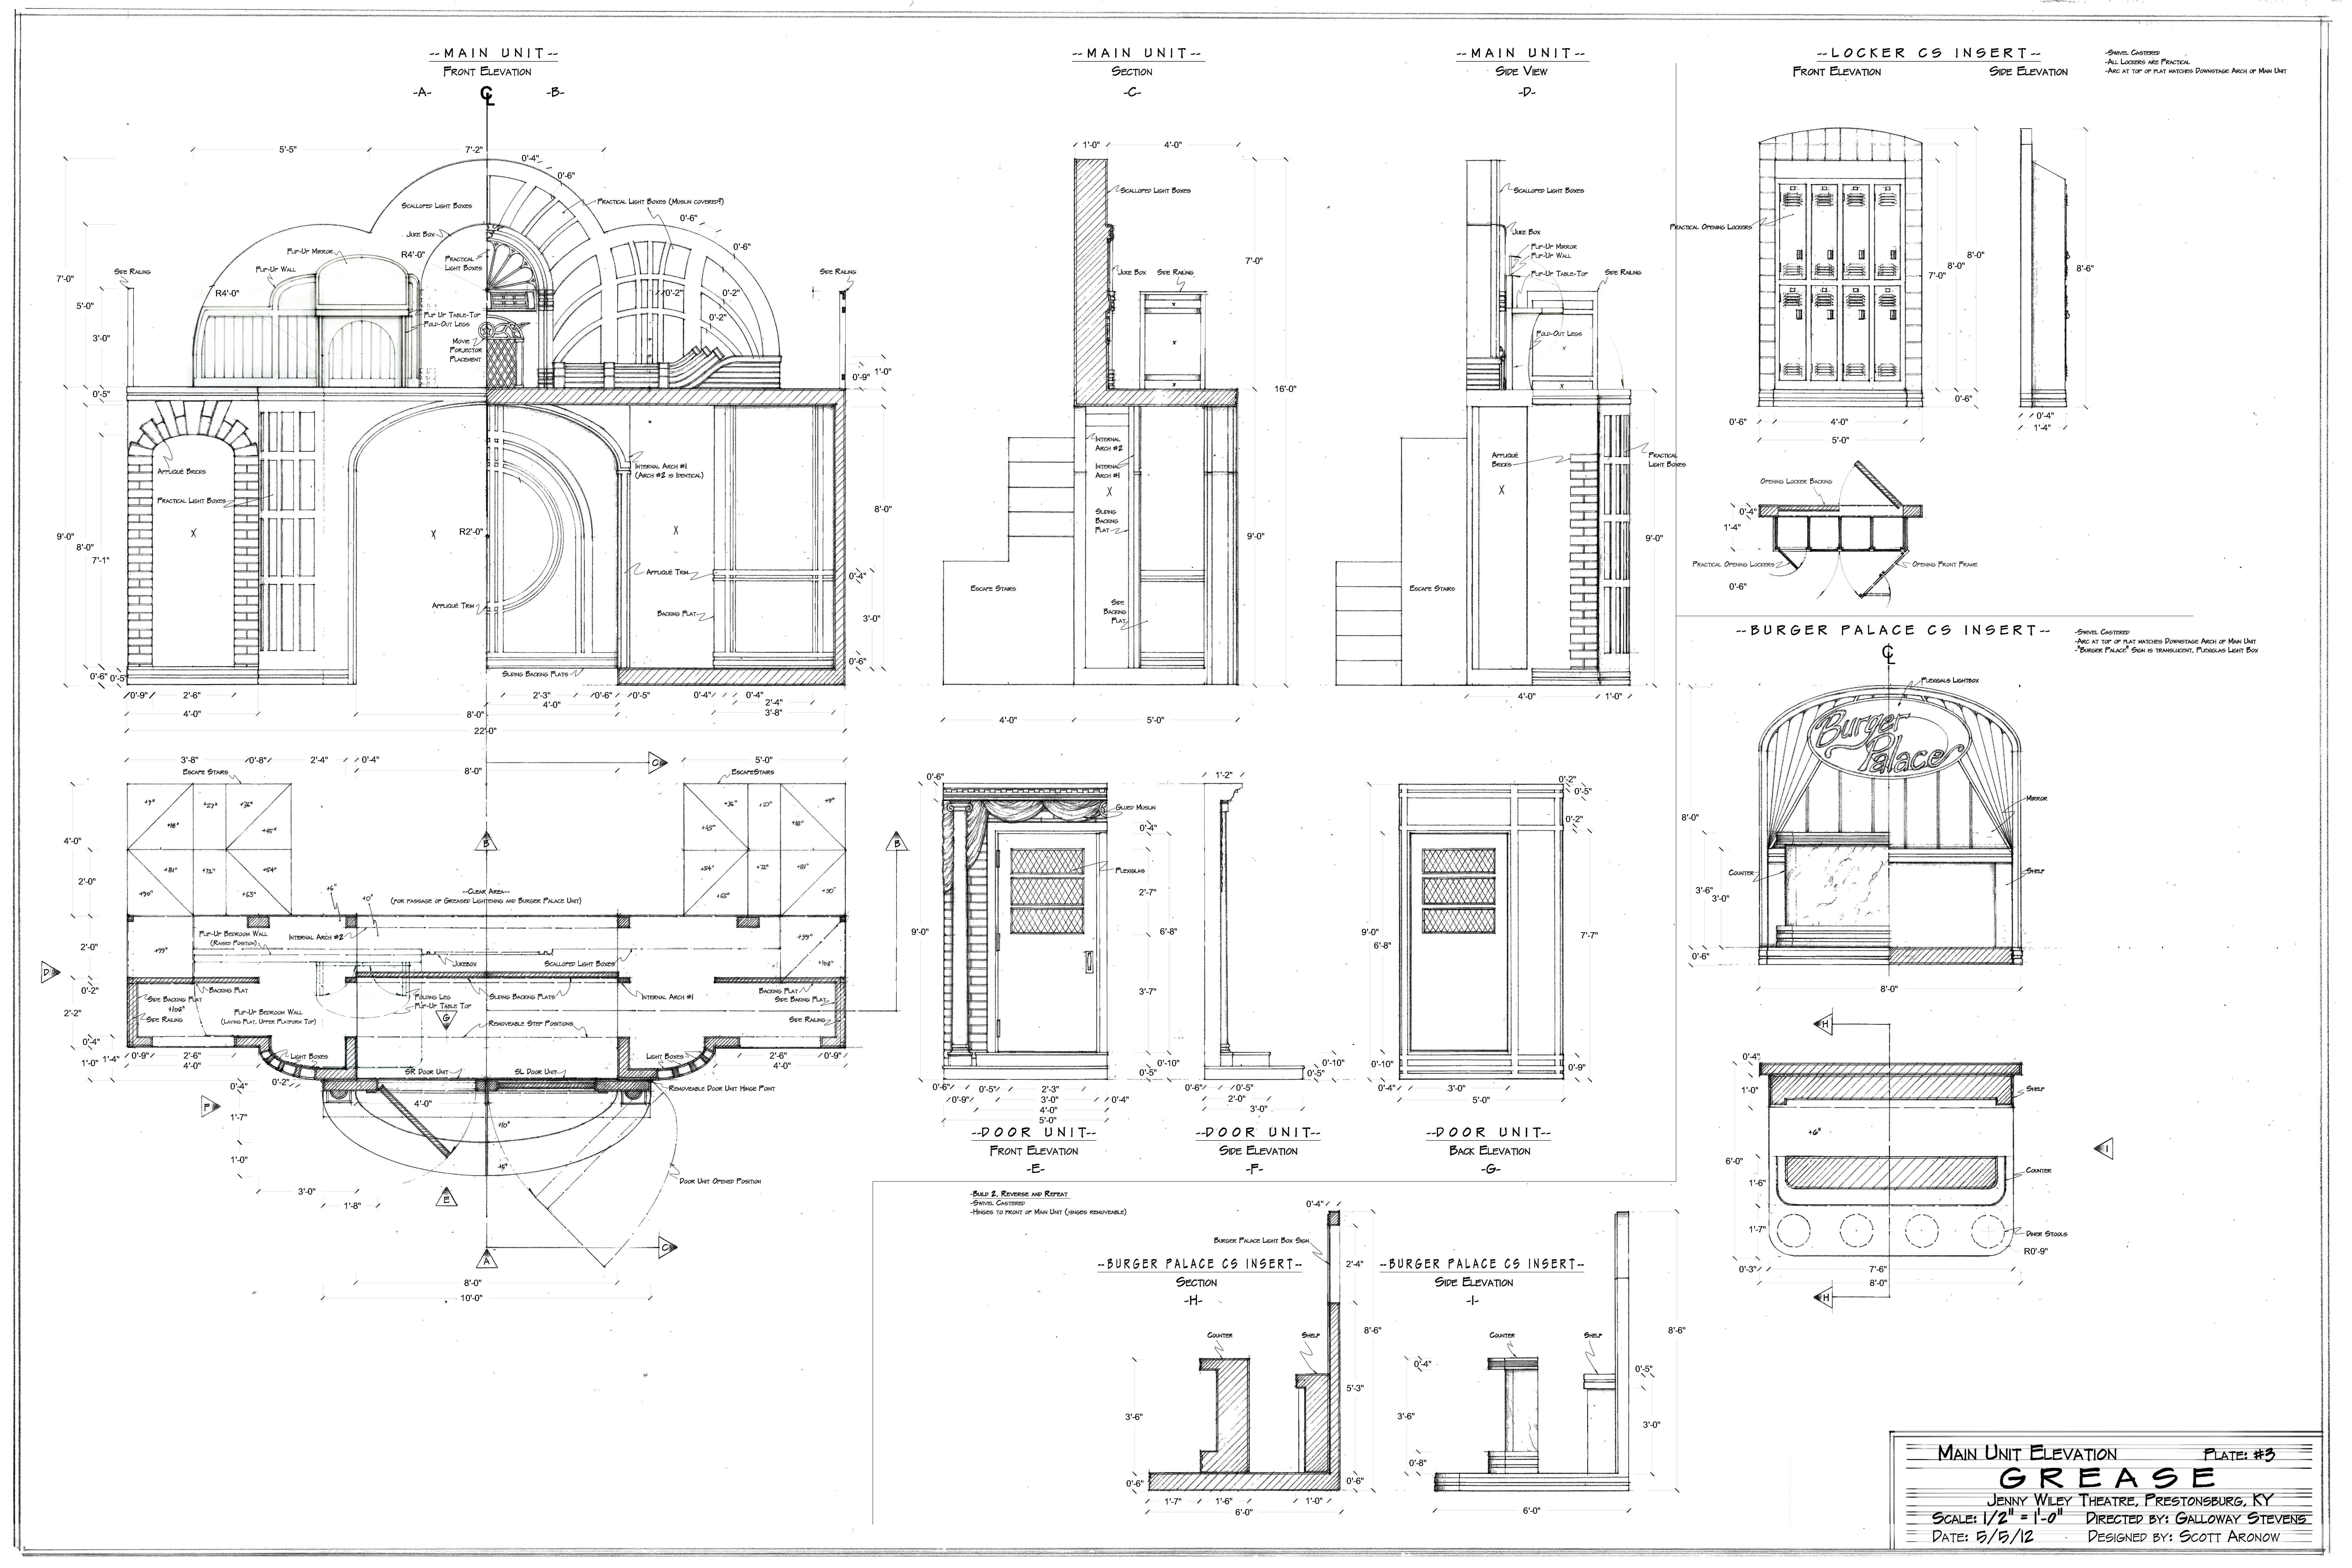 Plate #3-Main Unit Elevation